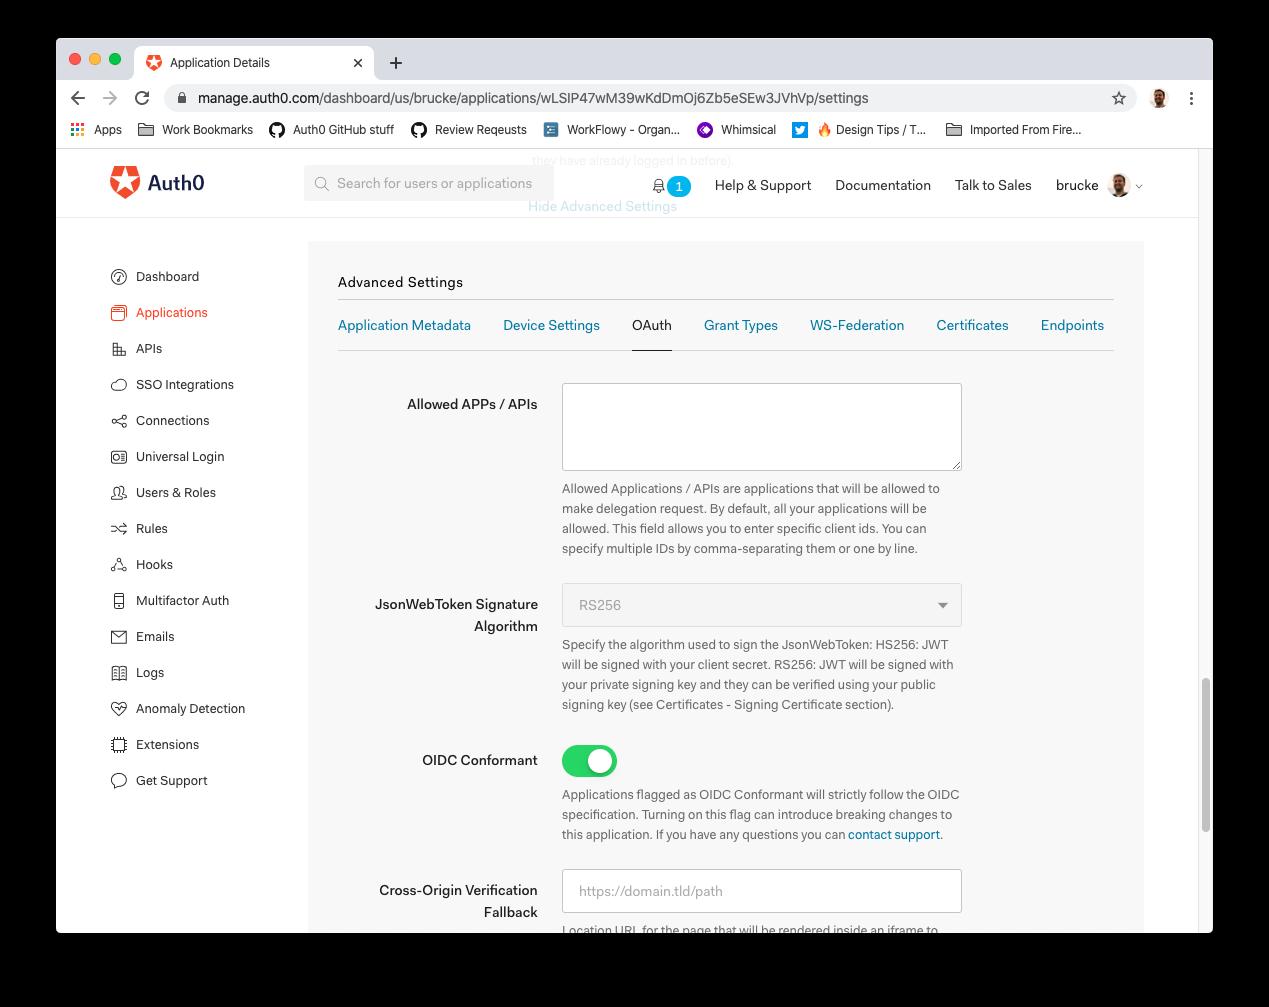 Token Signature Algorithm configuration